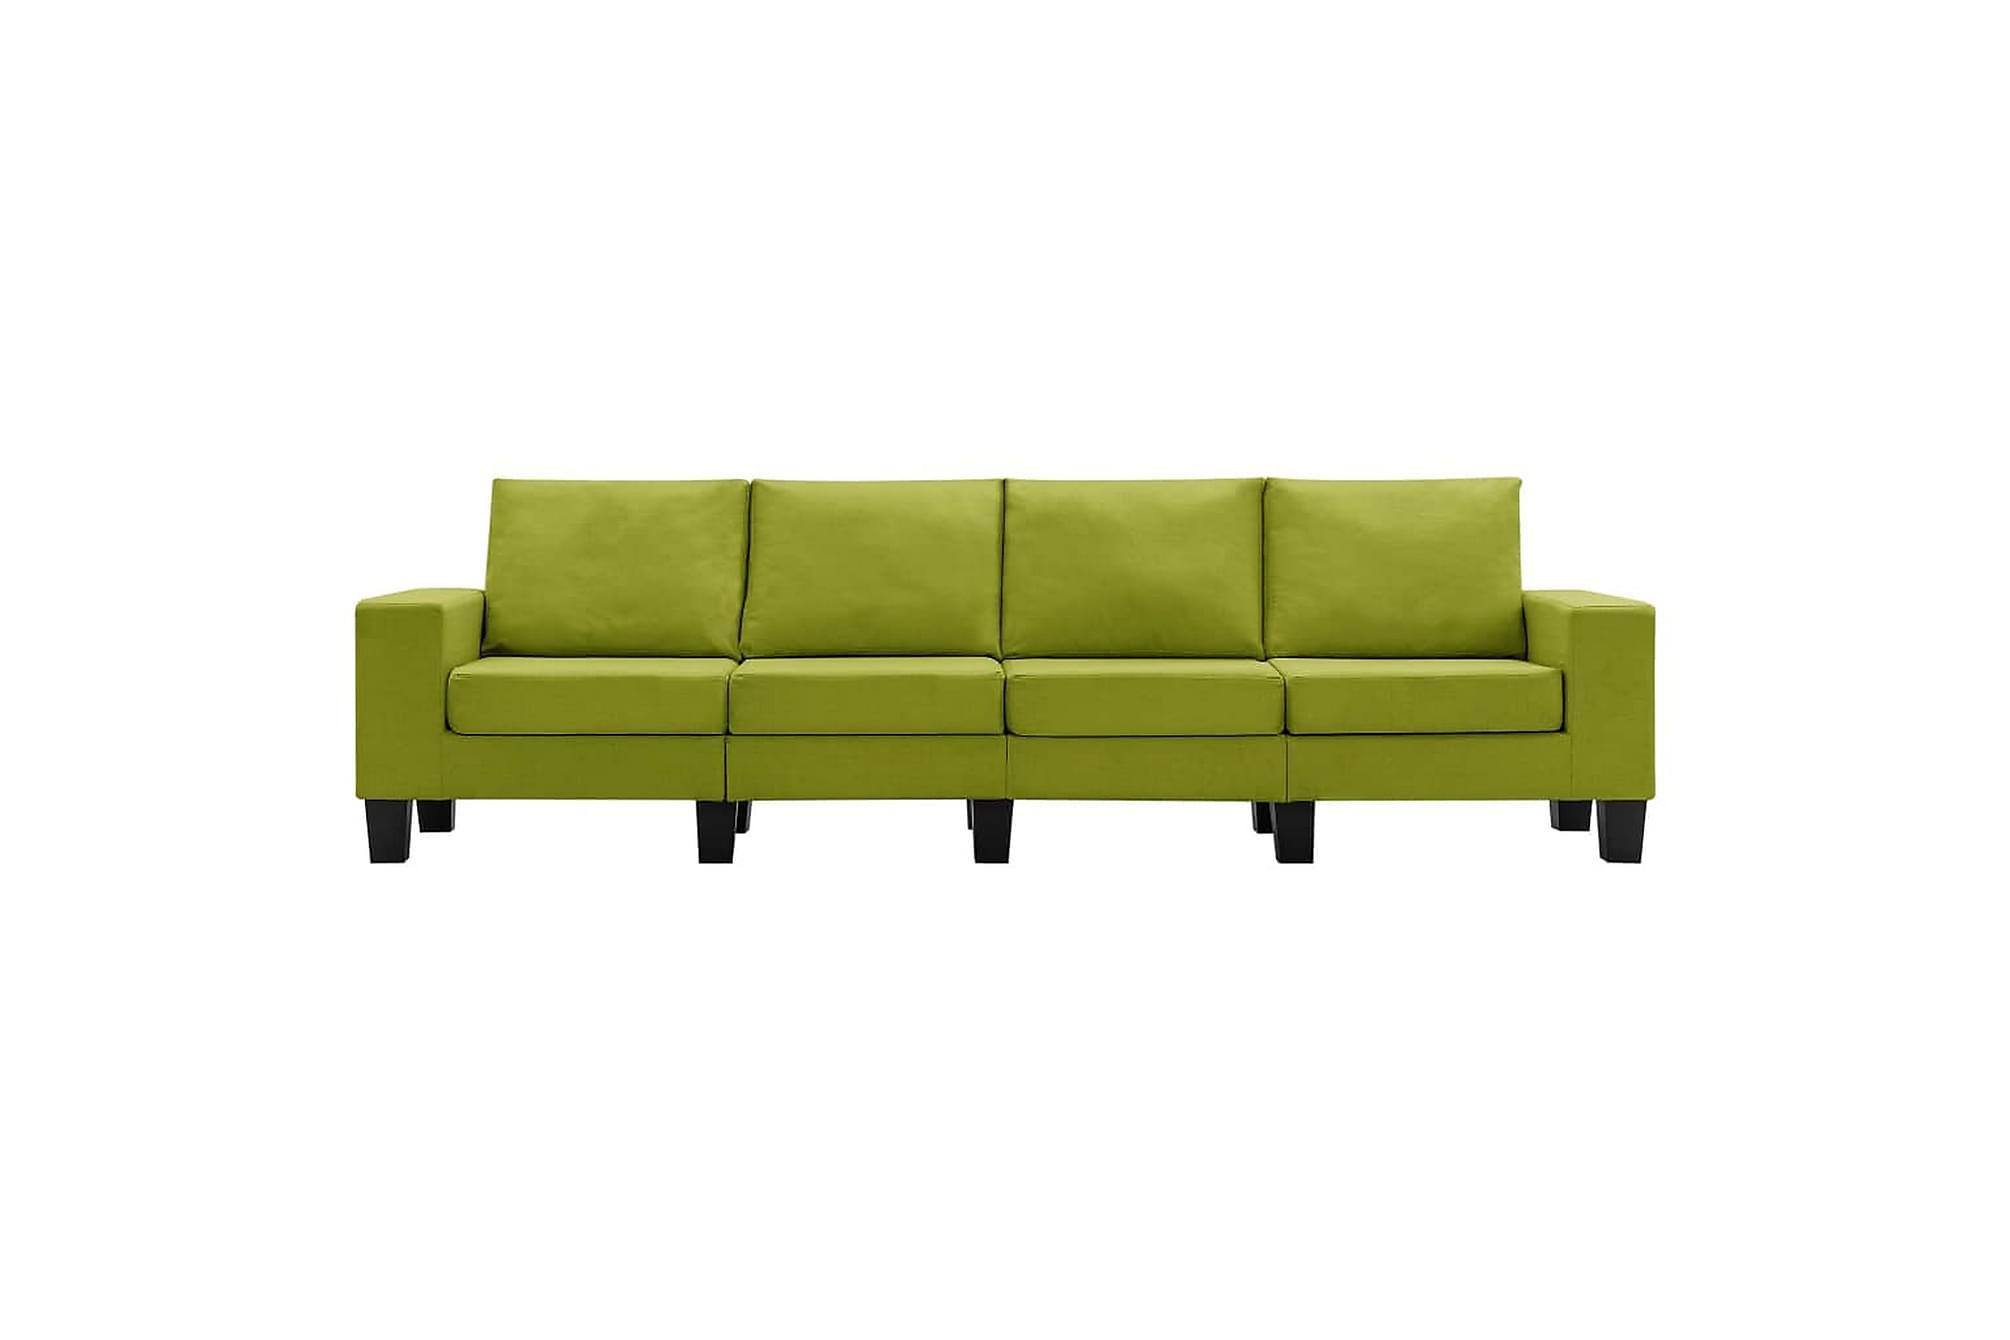 4-sitssoffa grön tyg